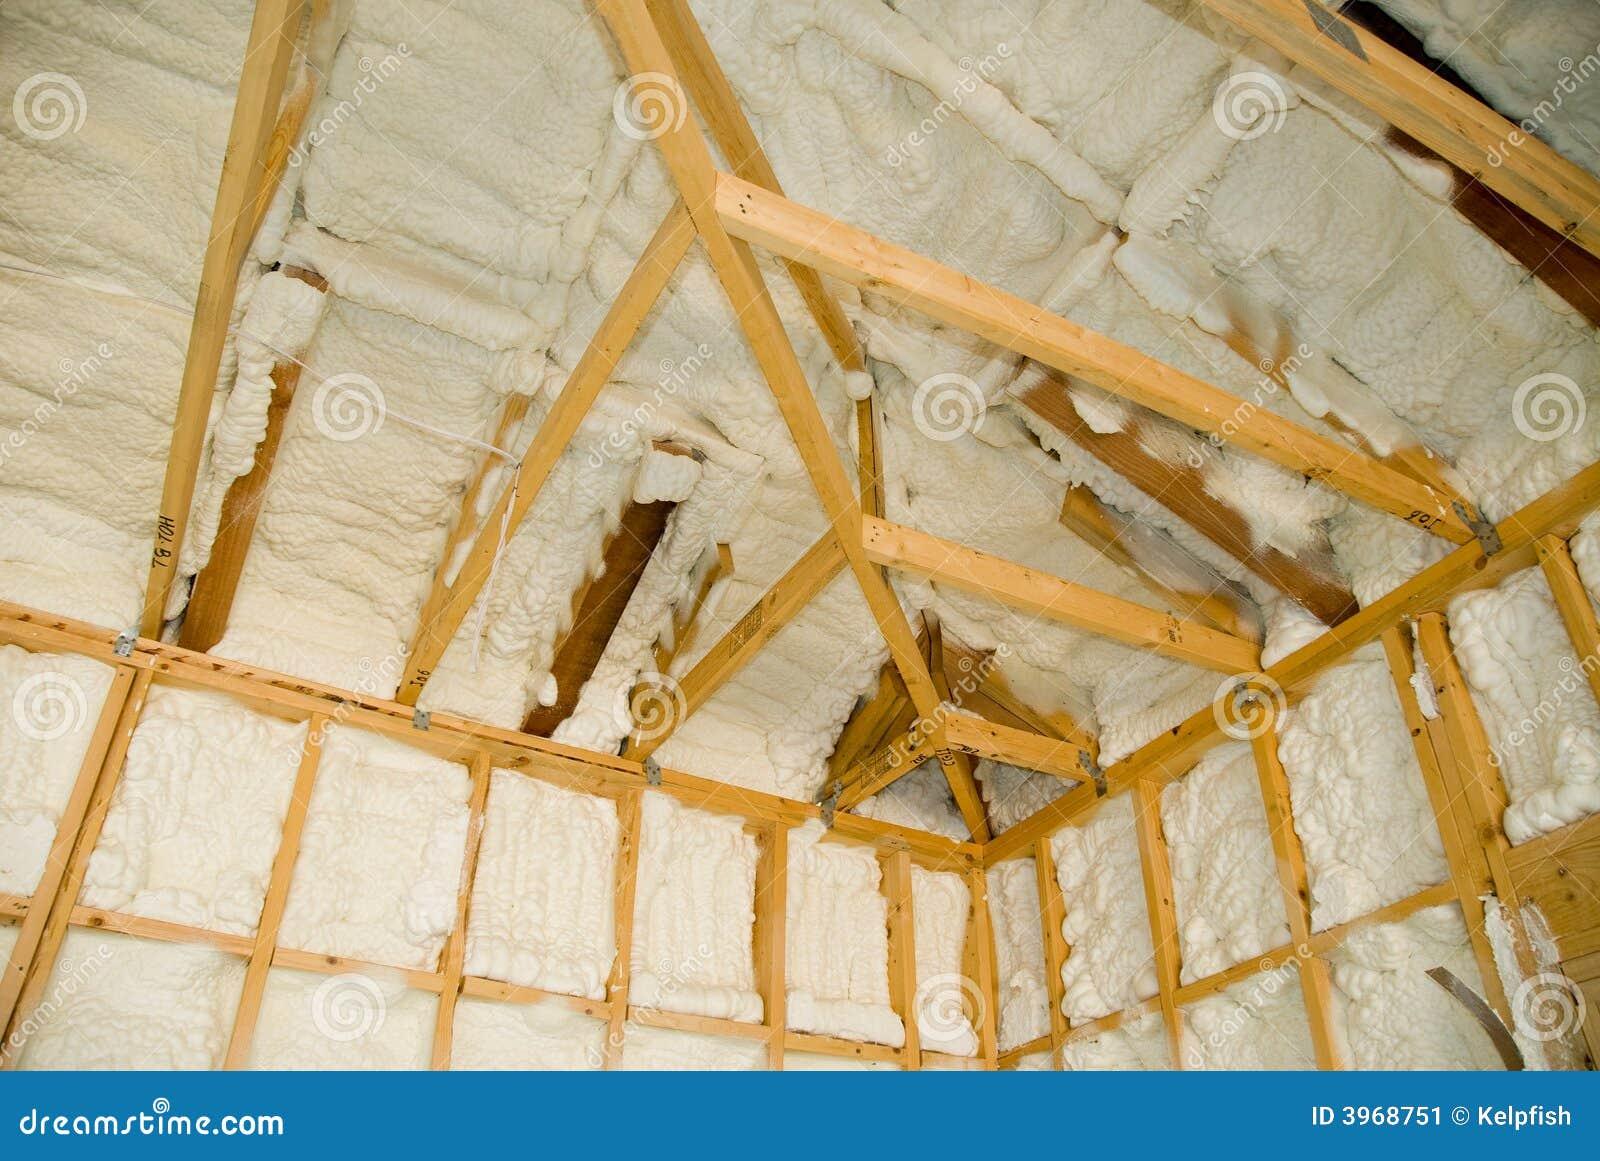 Newly sprayed insulation